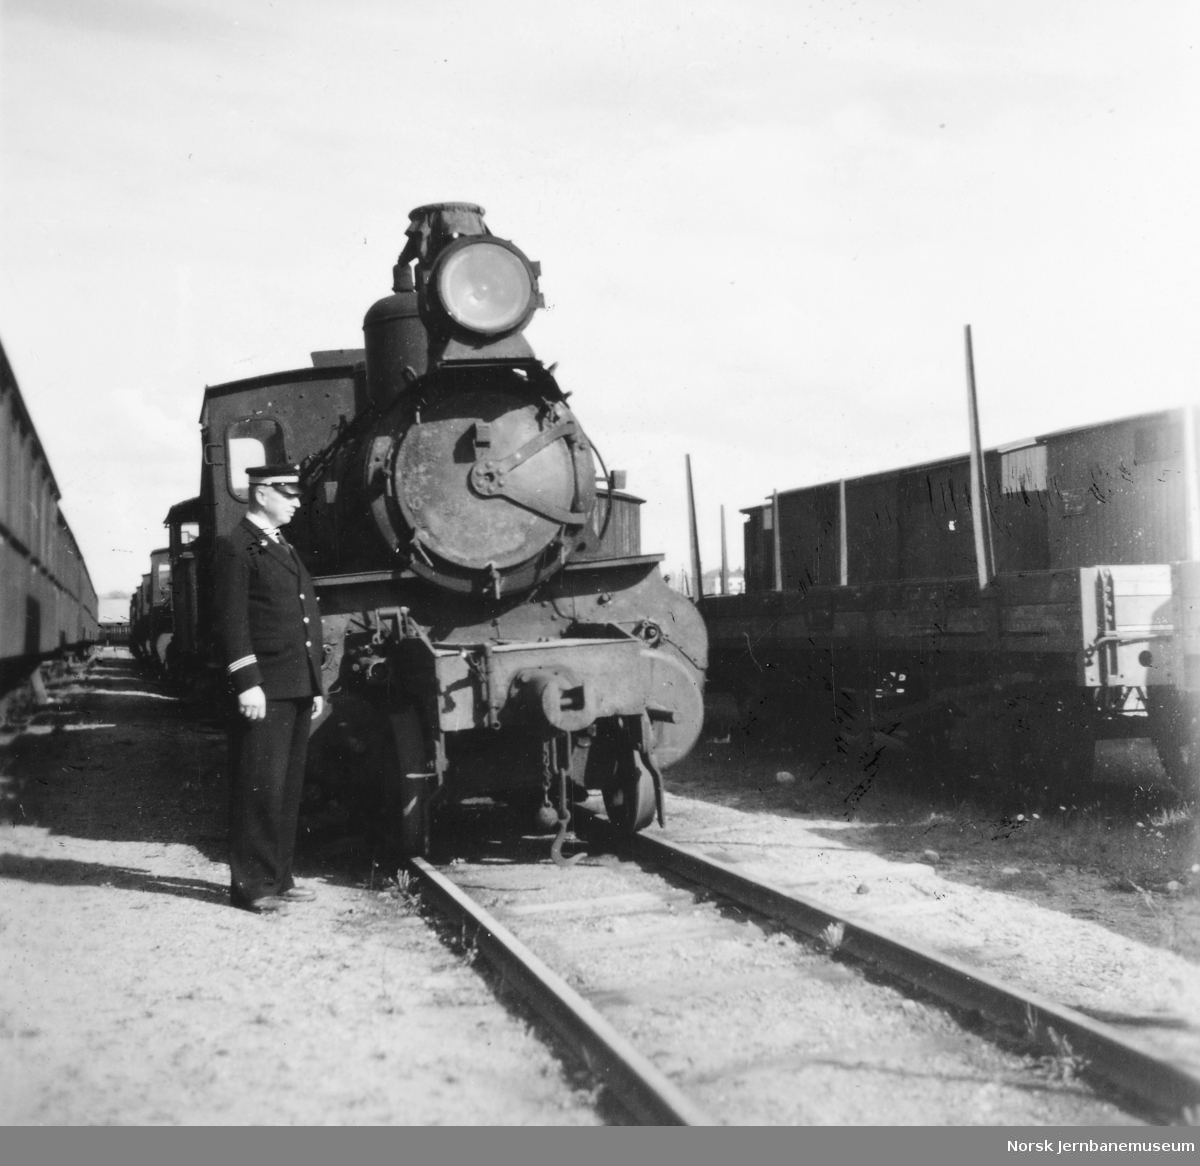 Hensatt smalspormateriell i Drammen - damplokomotiv og stasjonsmester Frydenlund